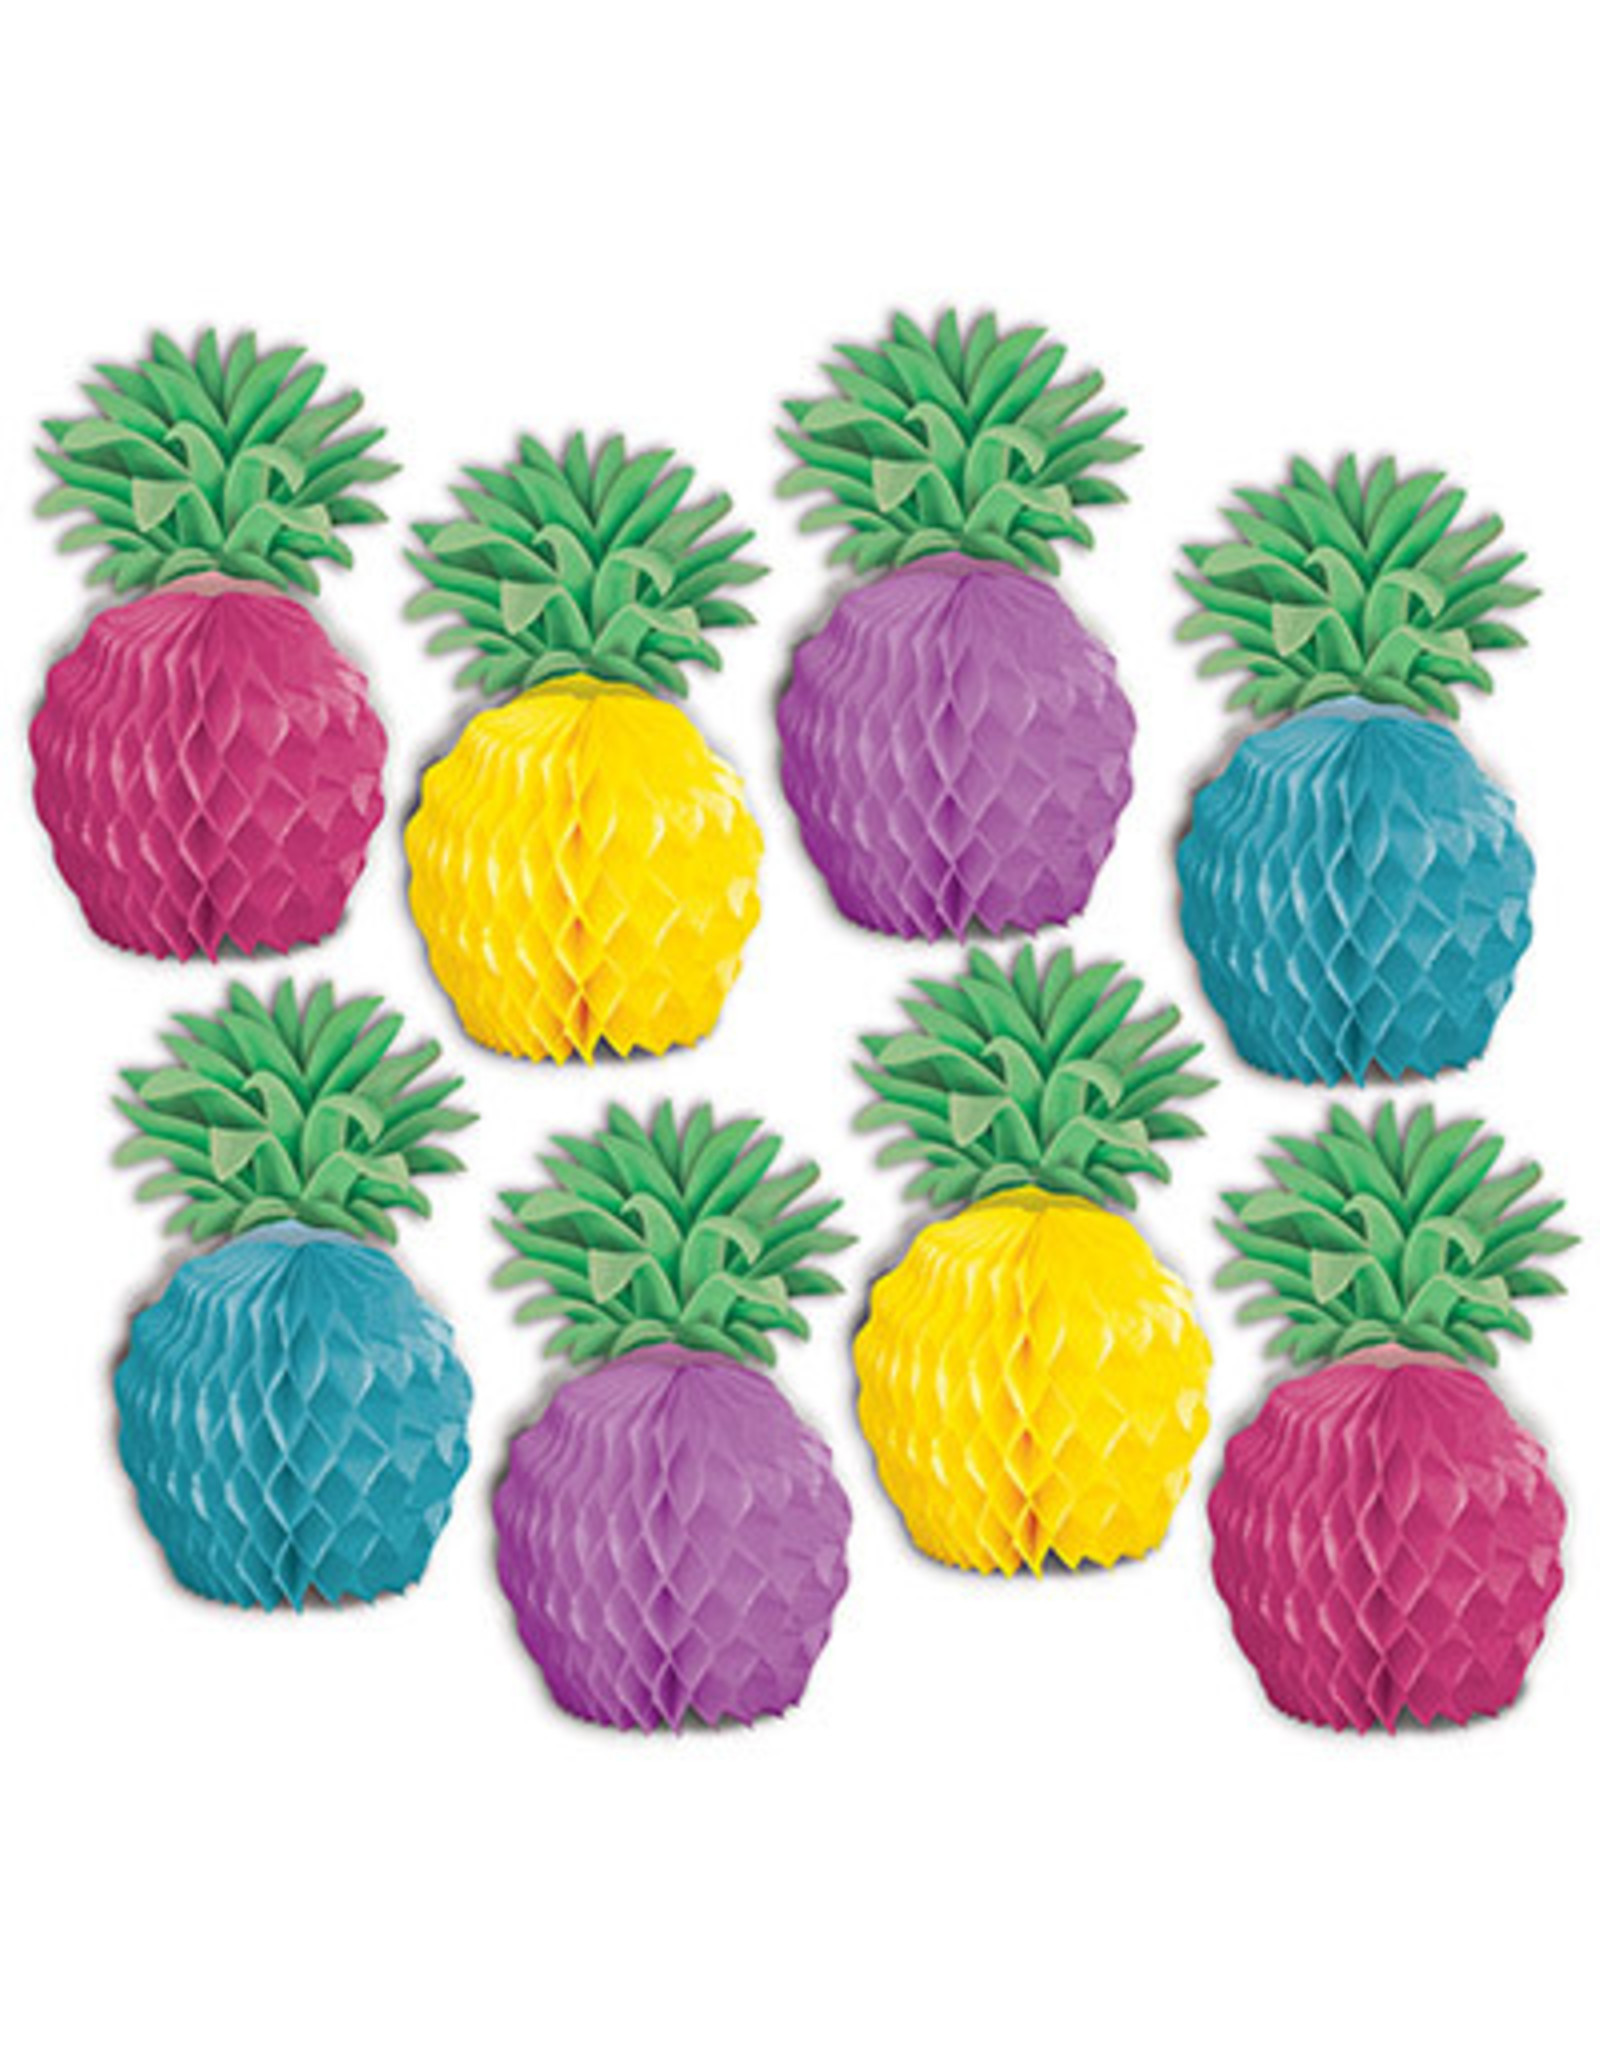 "Beistle 5.25"" Mini Pineapple Centerpieces - 8ct."